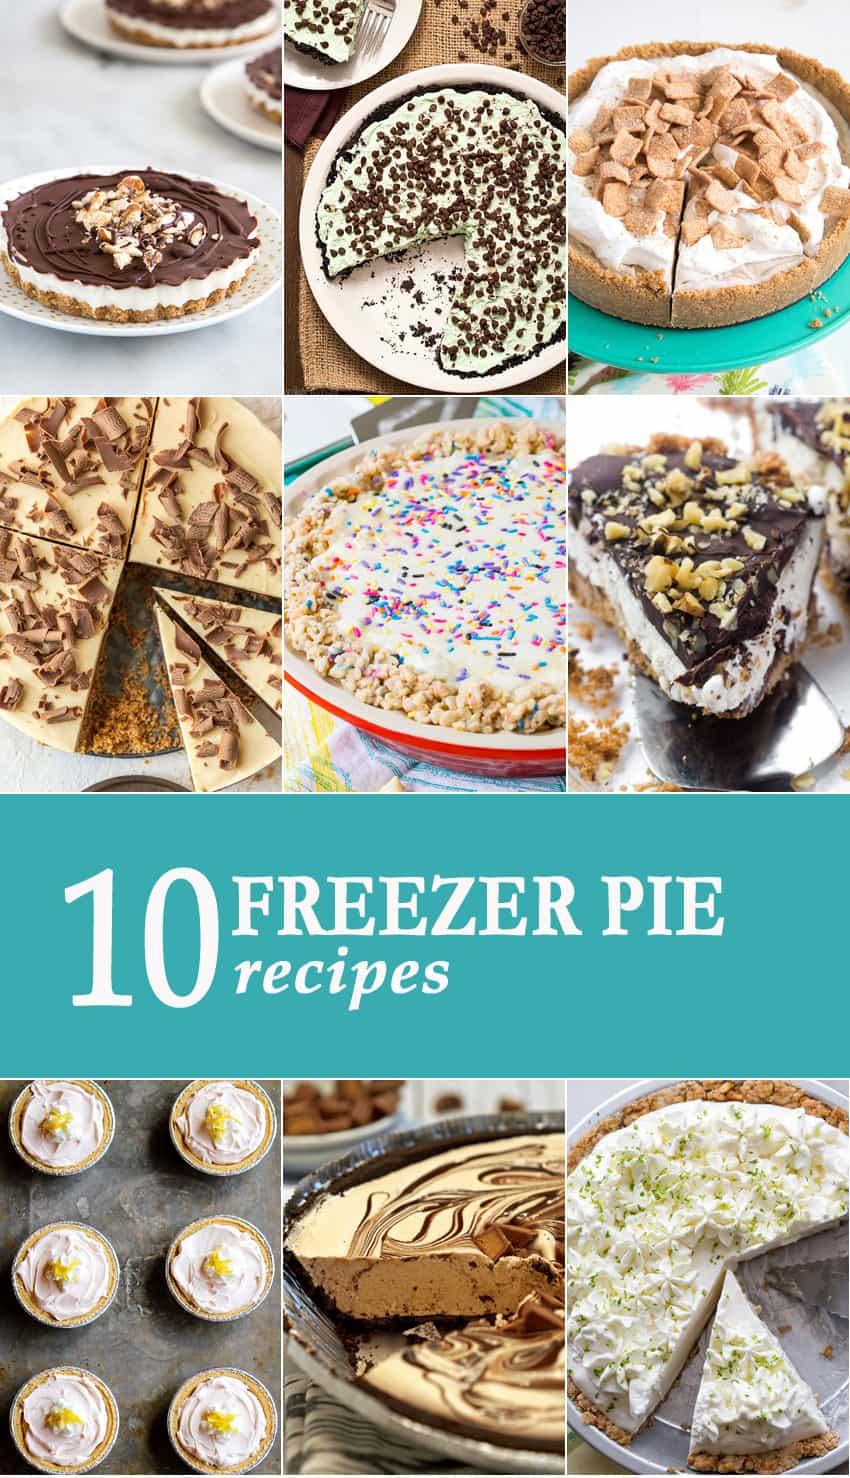 10 Freezer Pie Recipes